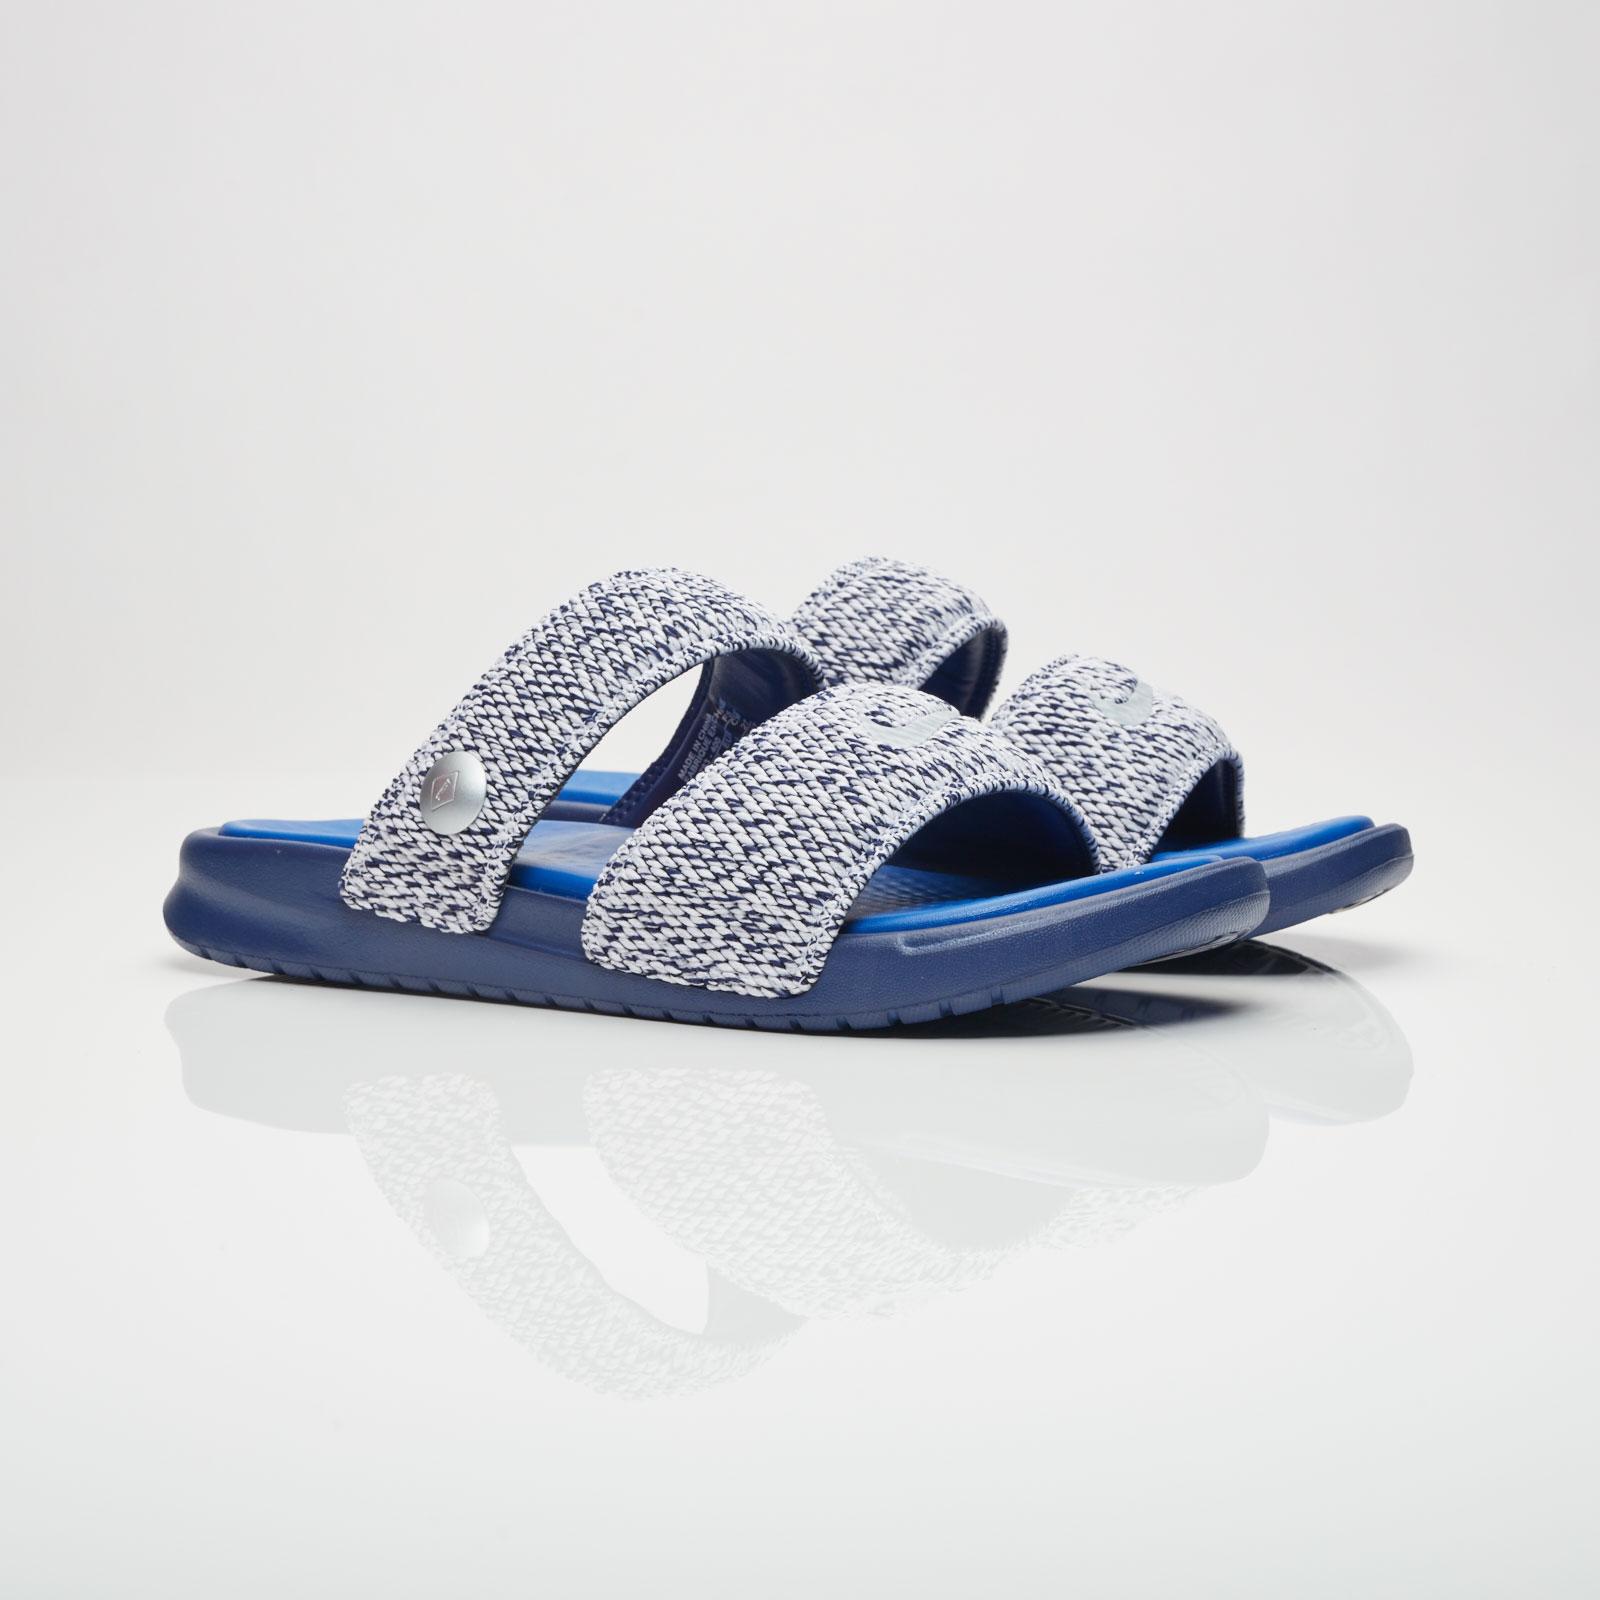 Nike Benassi Duo Ultra Slide   Pigalle - 902783-400 - Sneakersnstuff ... 60a67f5334c9